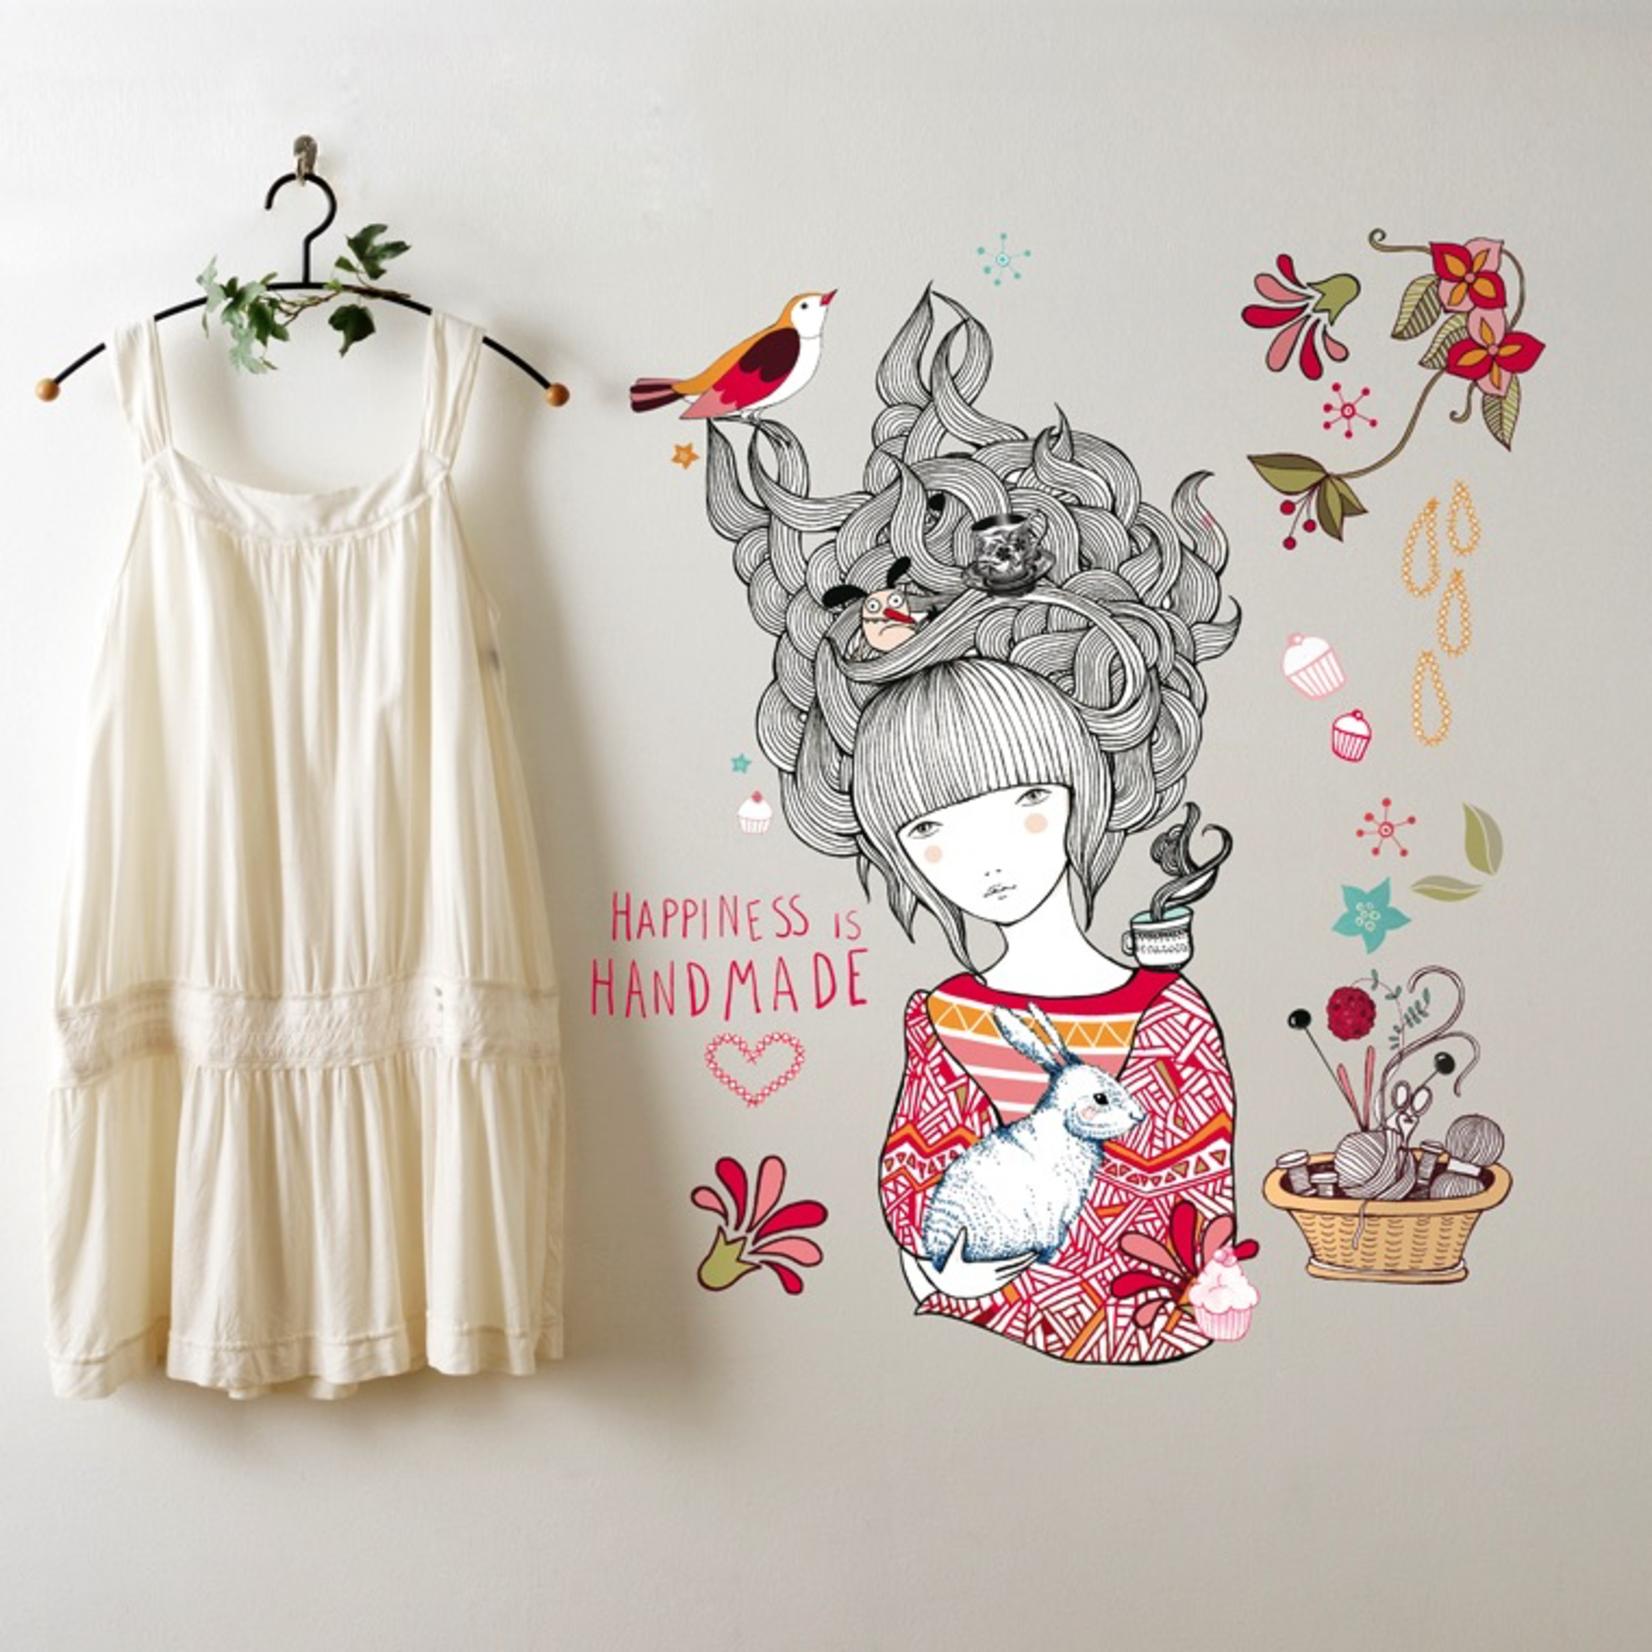 Chispum Happiness is Handmade Wall Sticker 41x57.5 cm